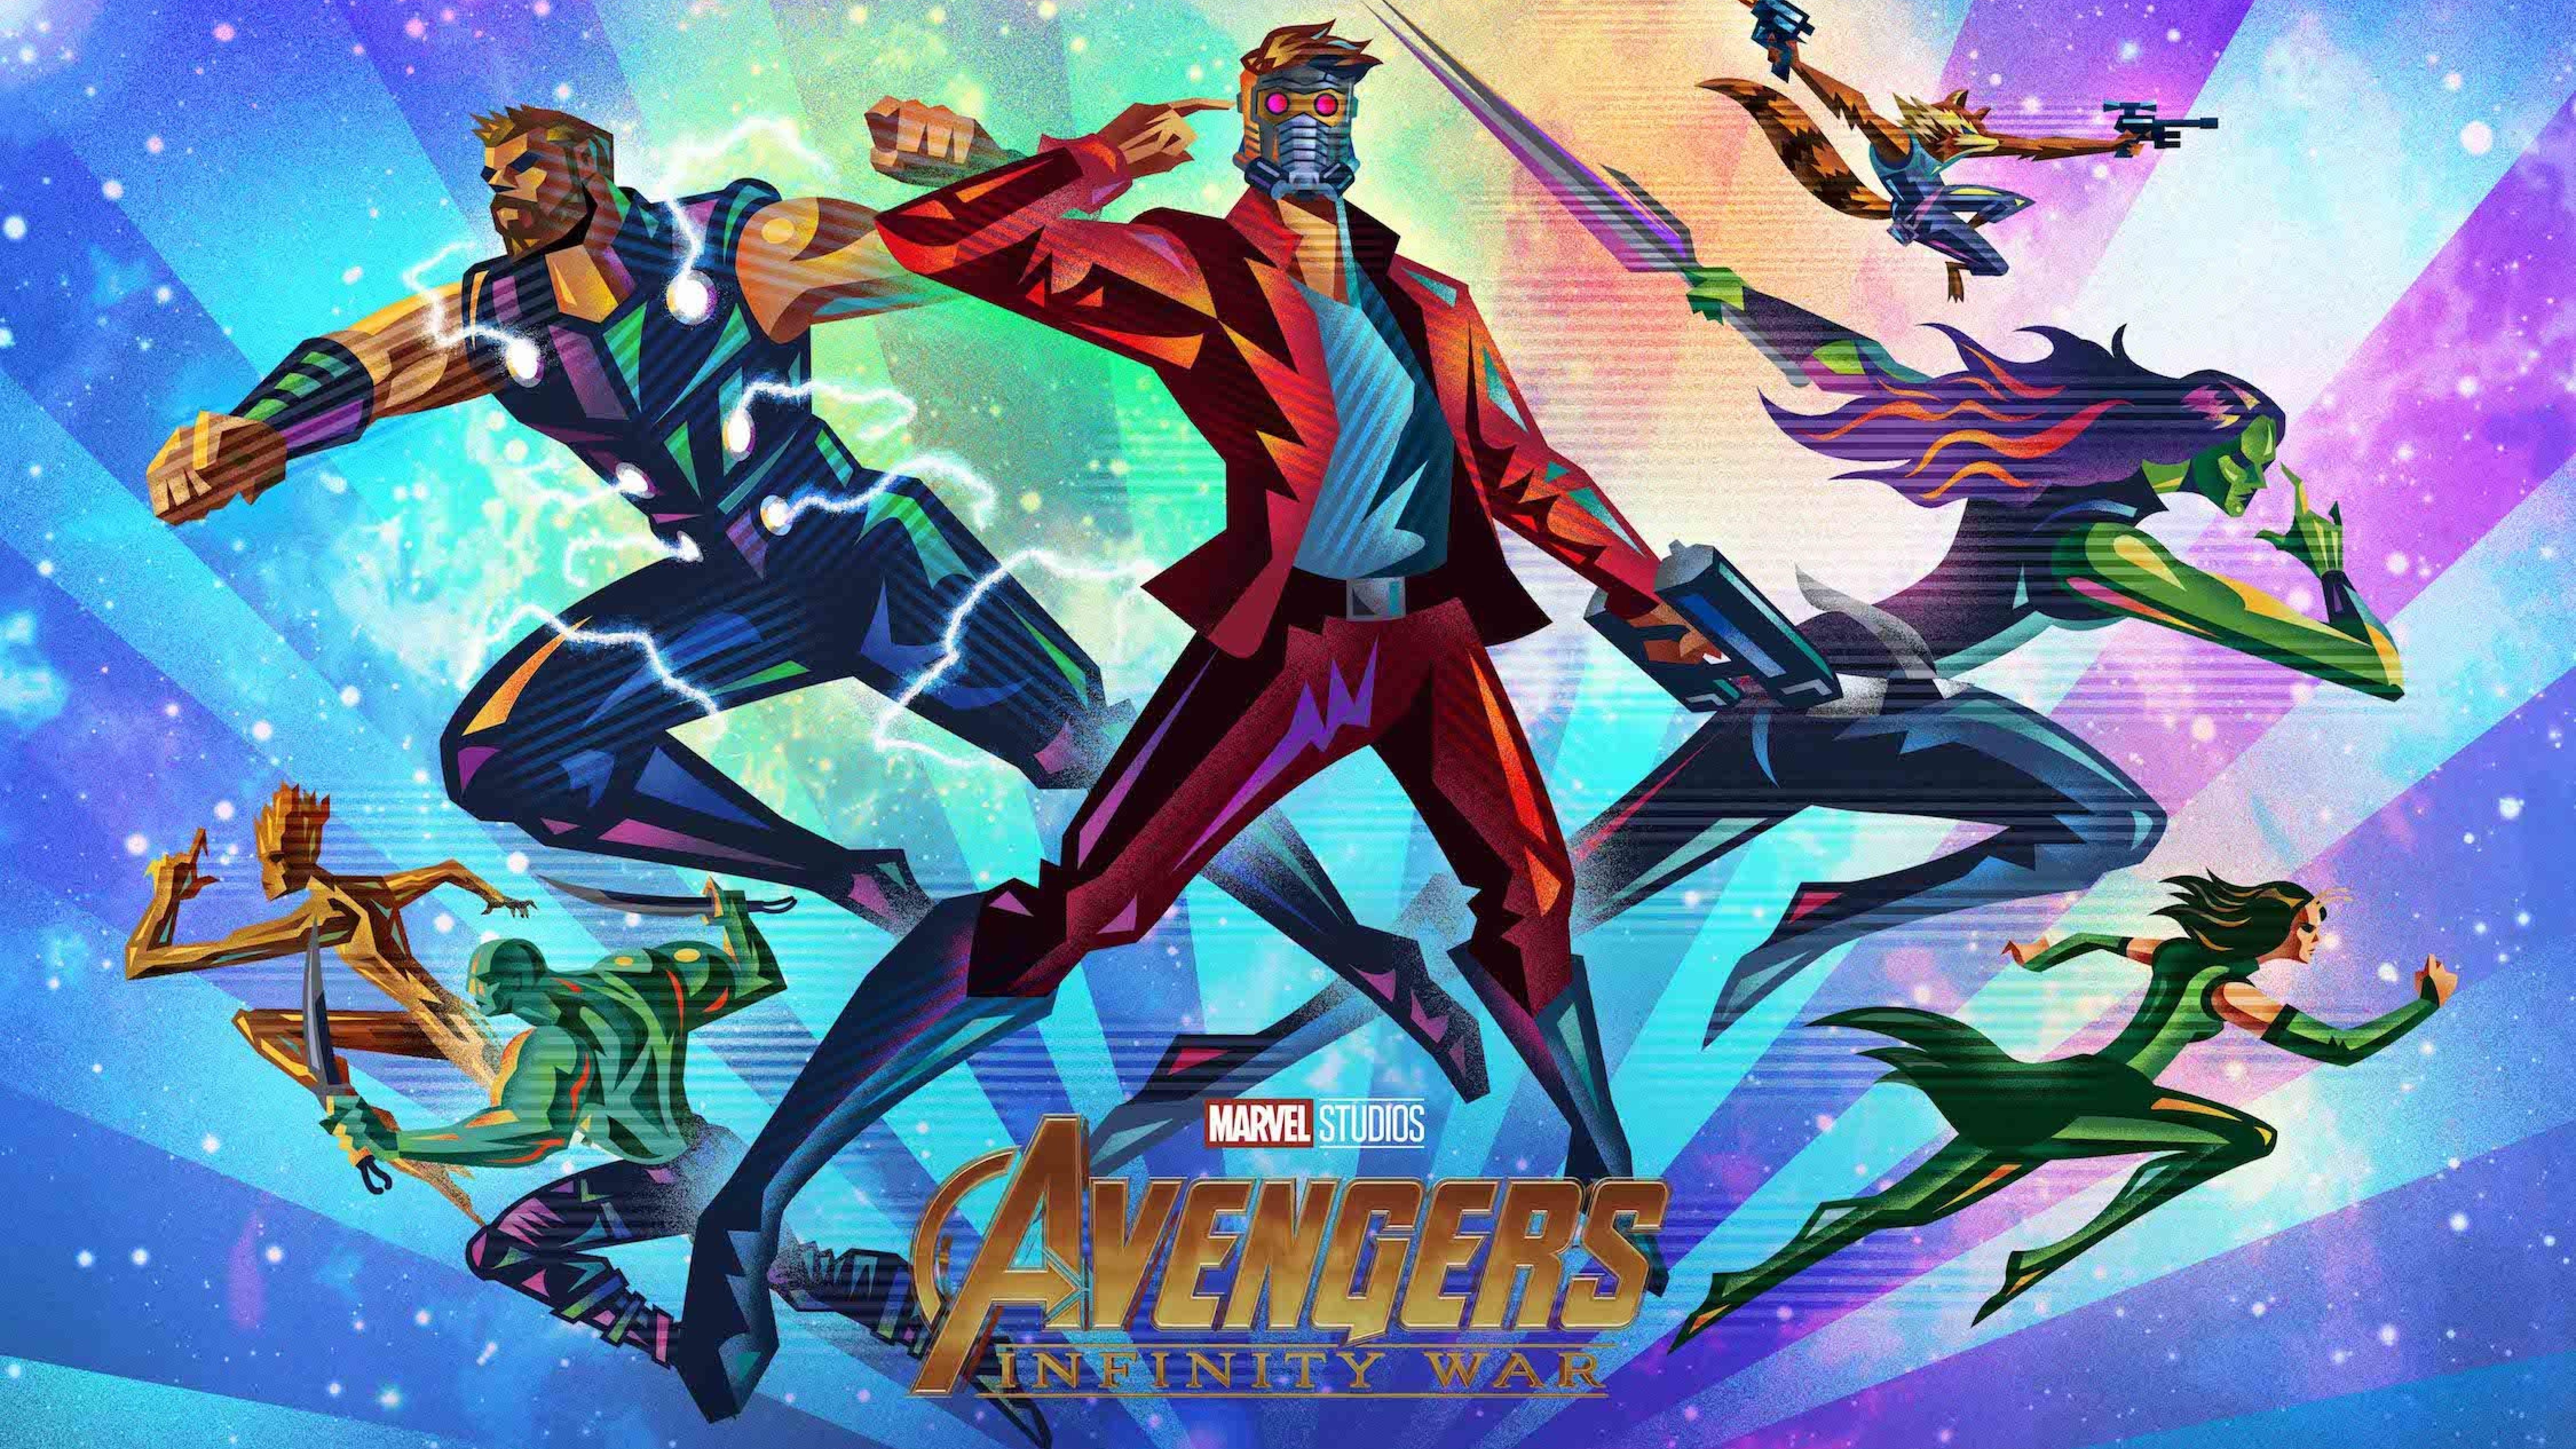 Download Avengers Infinity War Fandango Poster 840x1336